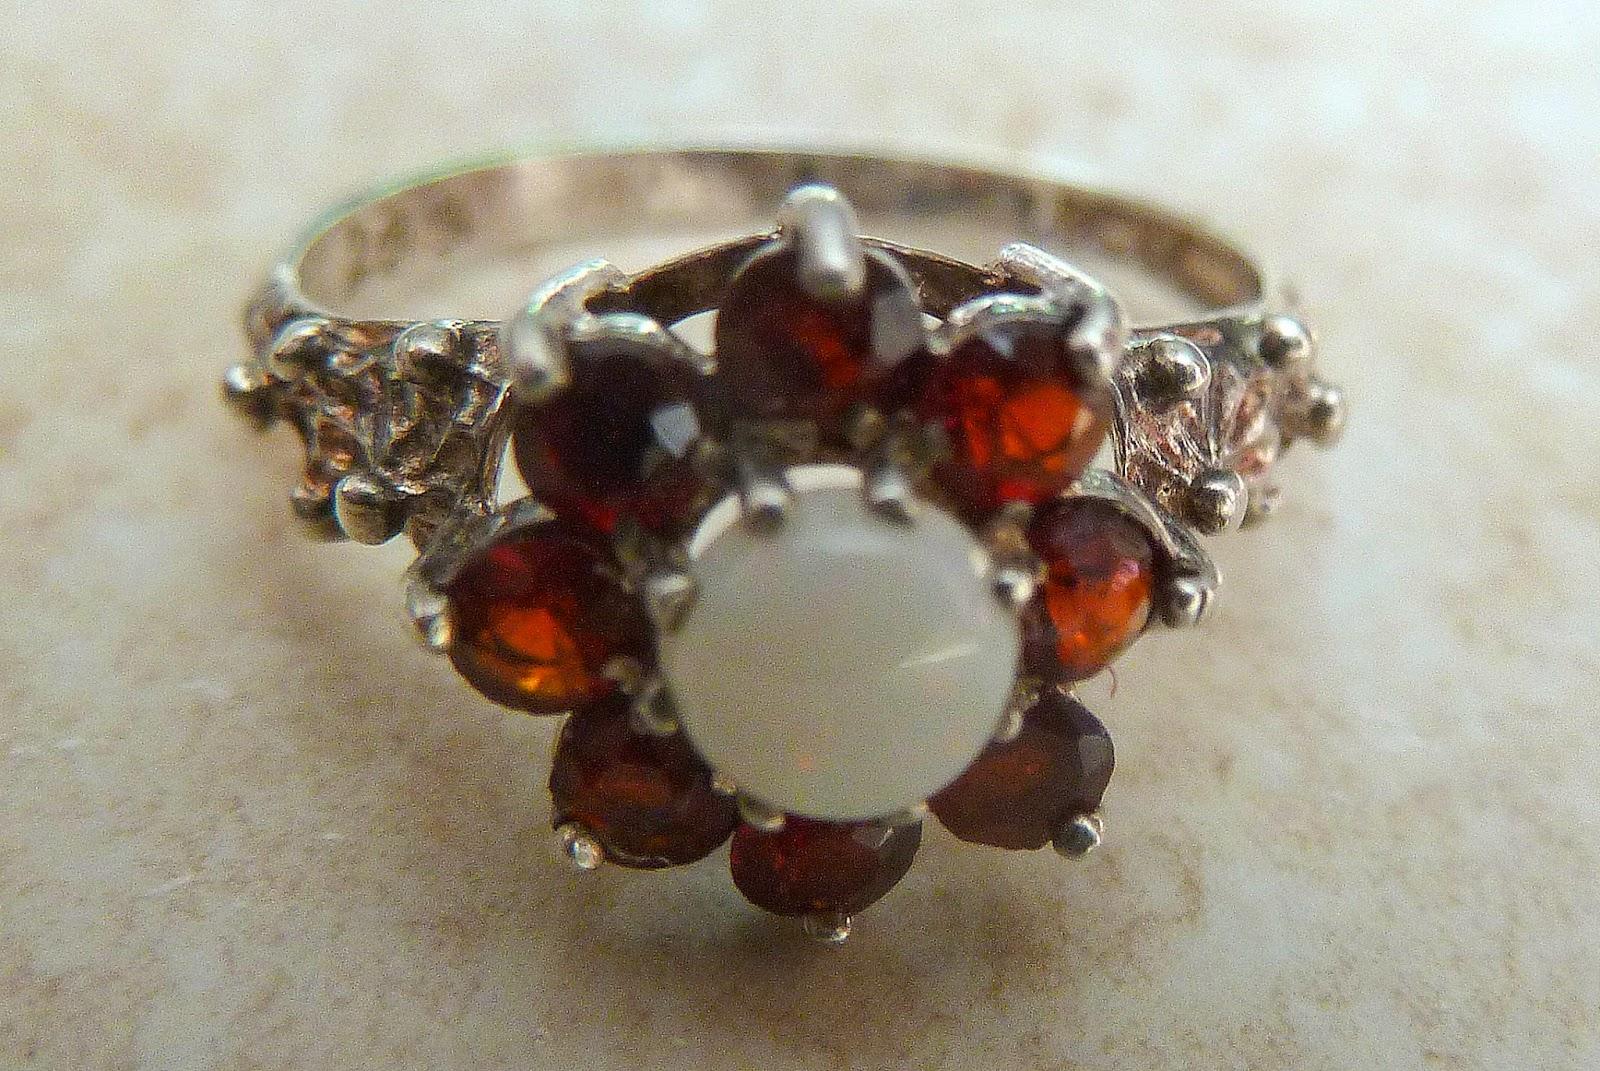 http://www.kcavintagegems.uk/vintage-sterling-silver-garnet-and-opal-ring-358-p.asp